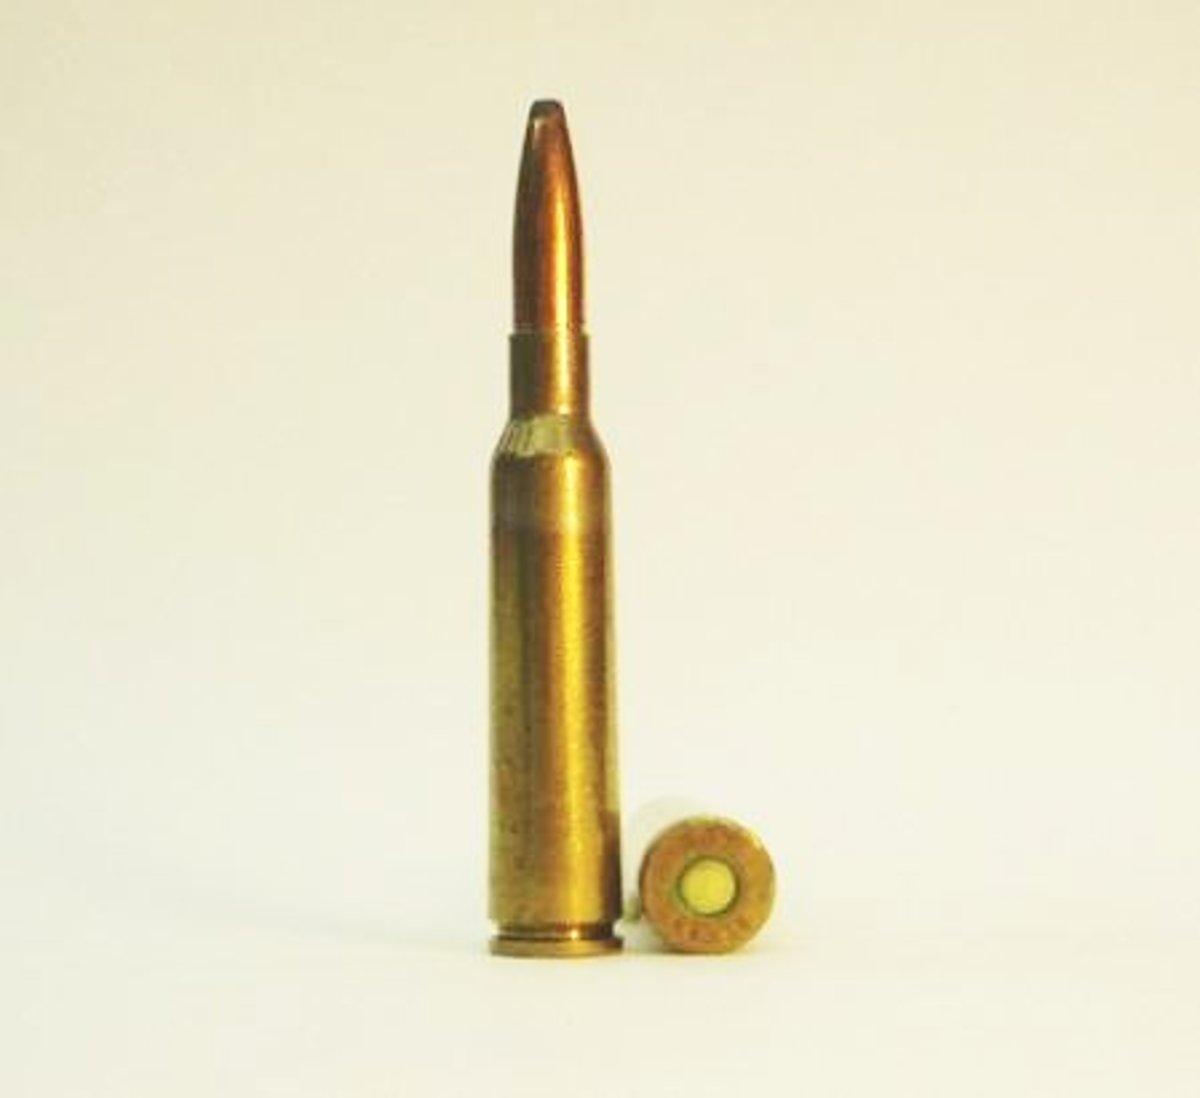 6.5x55mm Swedish